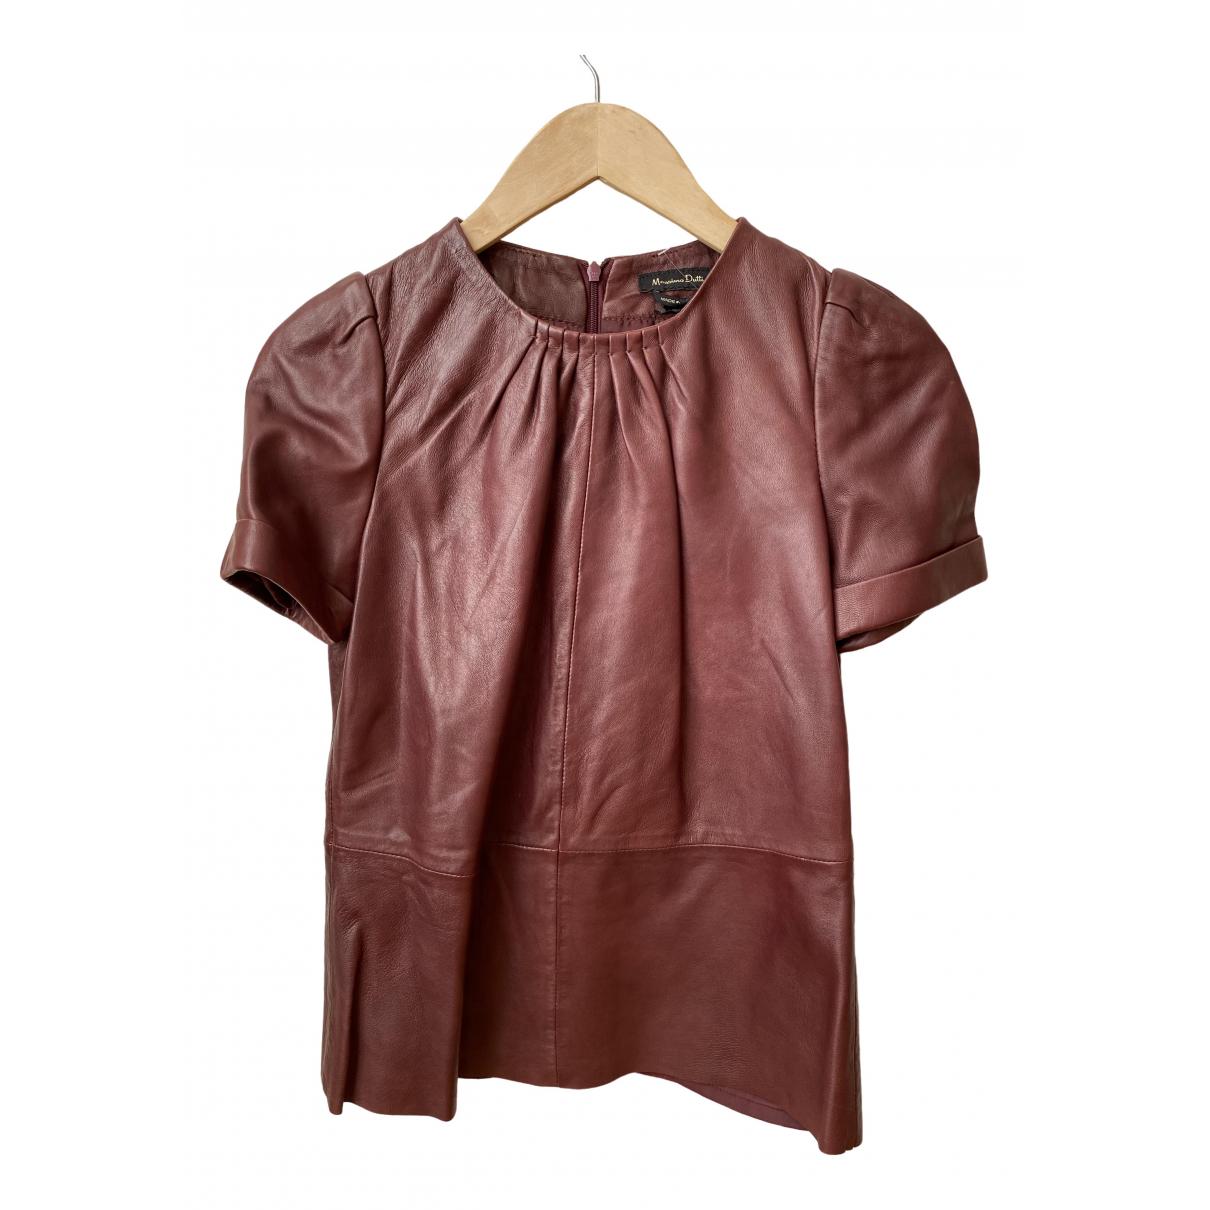 Massimo Dutti \N Burgundy Leather  top for Women XS International